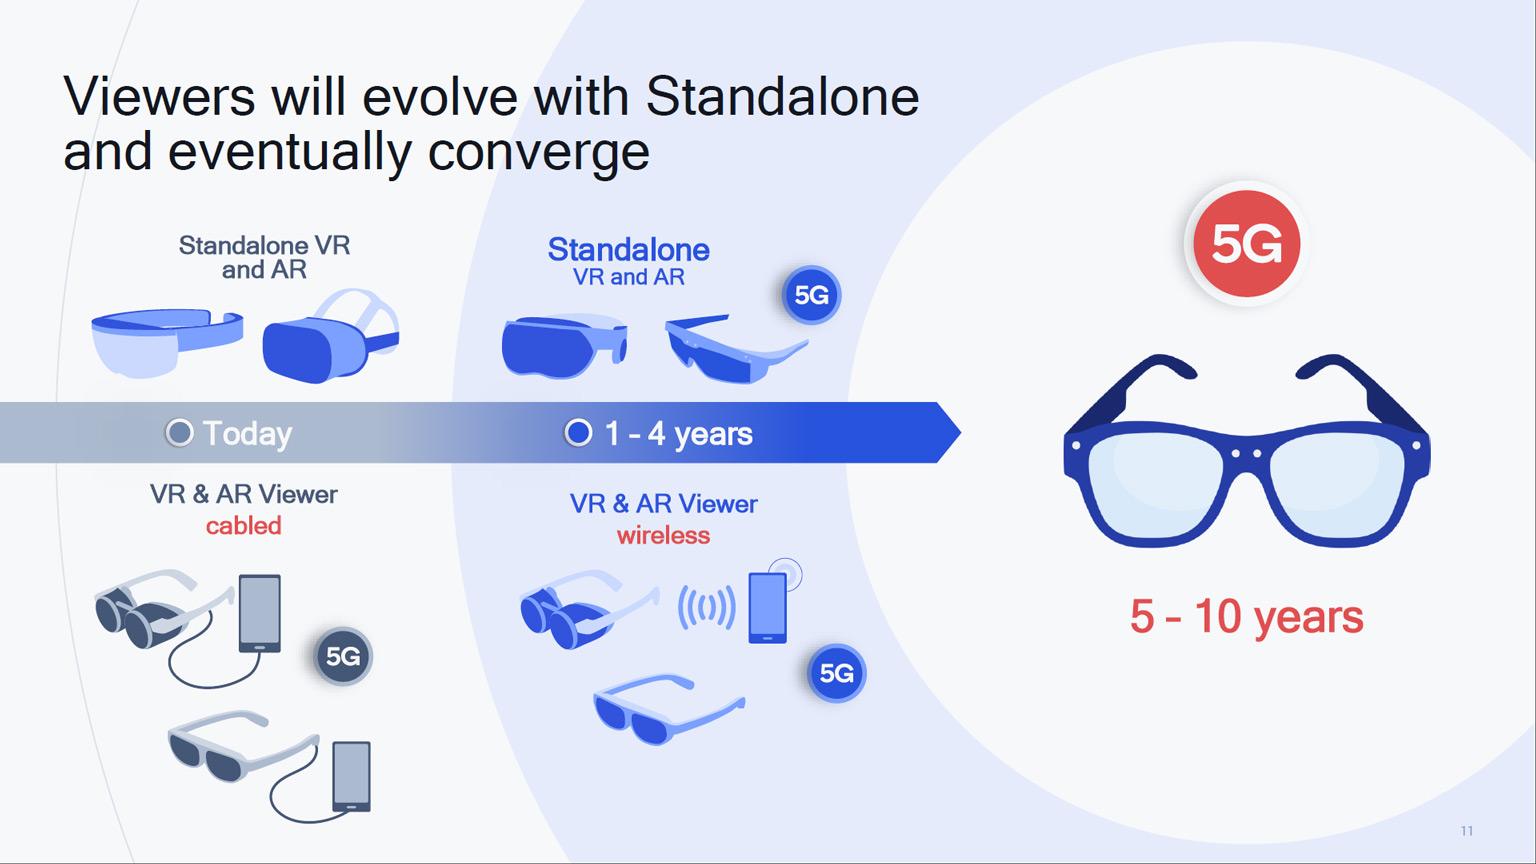 Qualcomm AR VR timeline